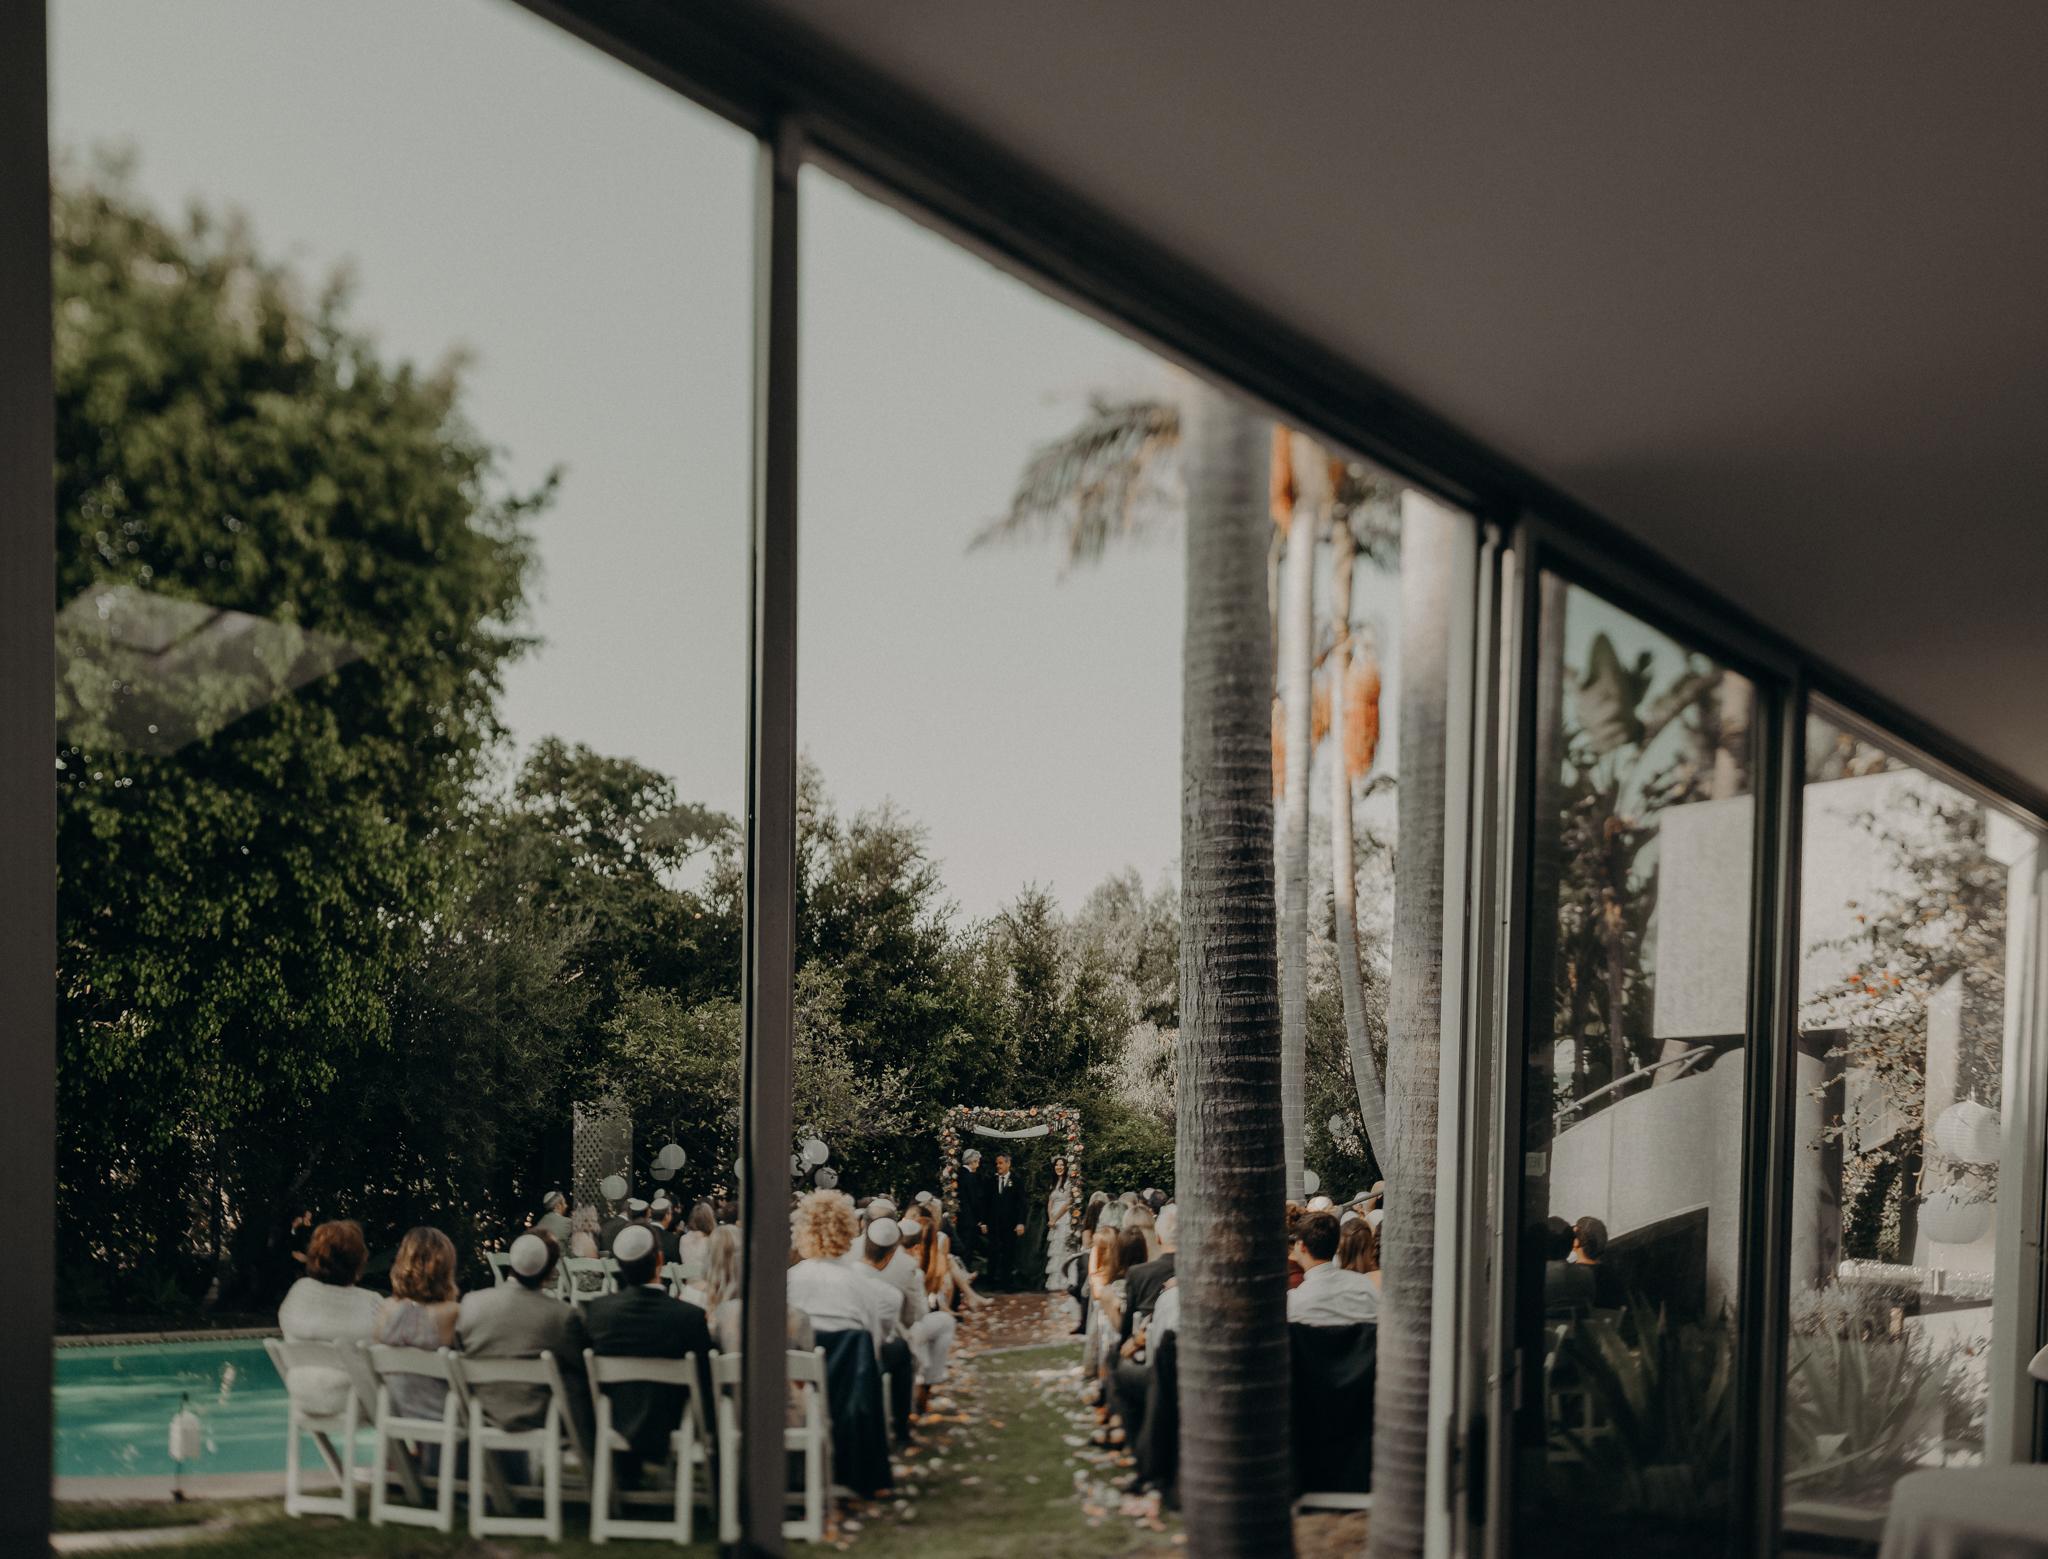 Isaiah + Taylor Photography - Private Estate Backyard Wedding - Beverly Hills - Los Angeles Wedding Photographer - 77.jpg